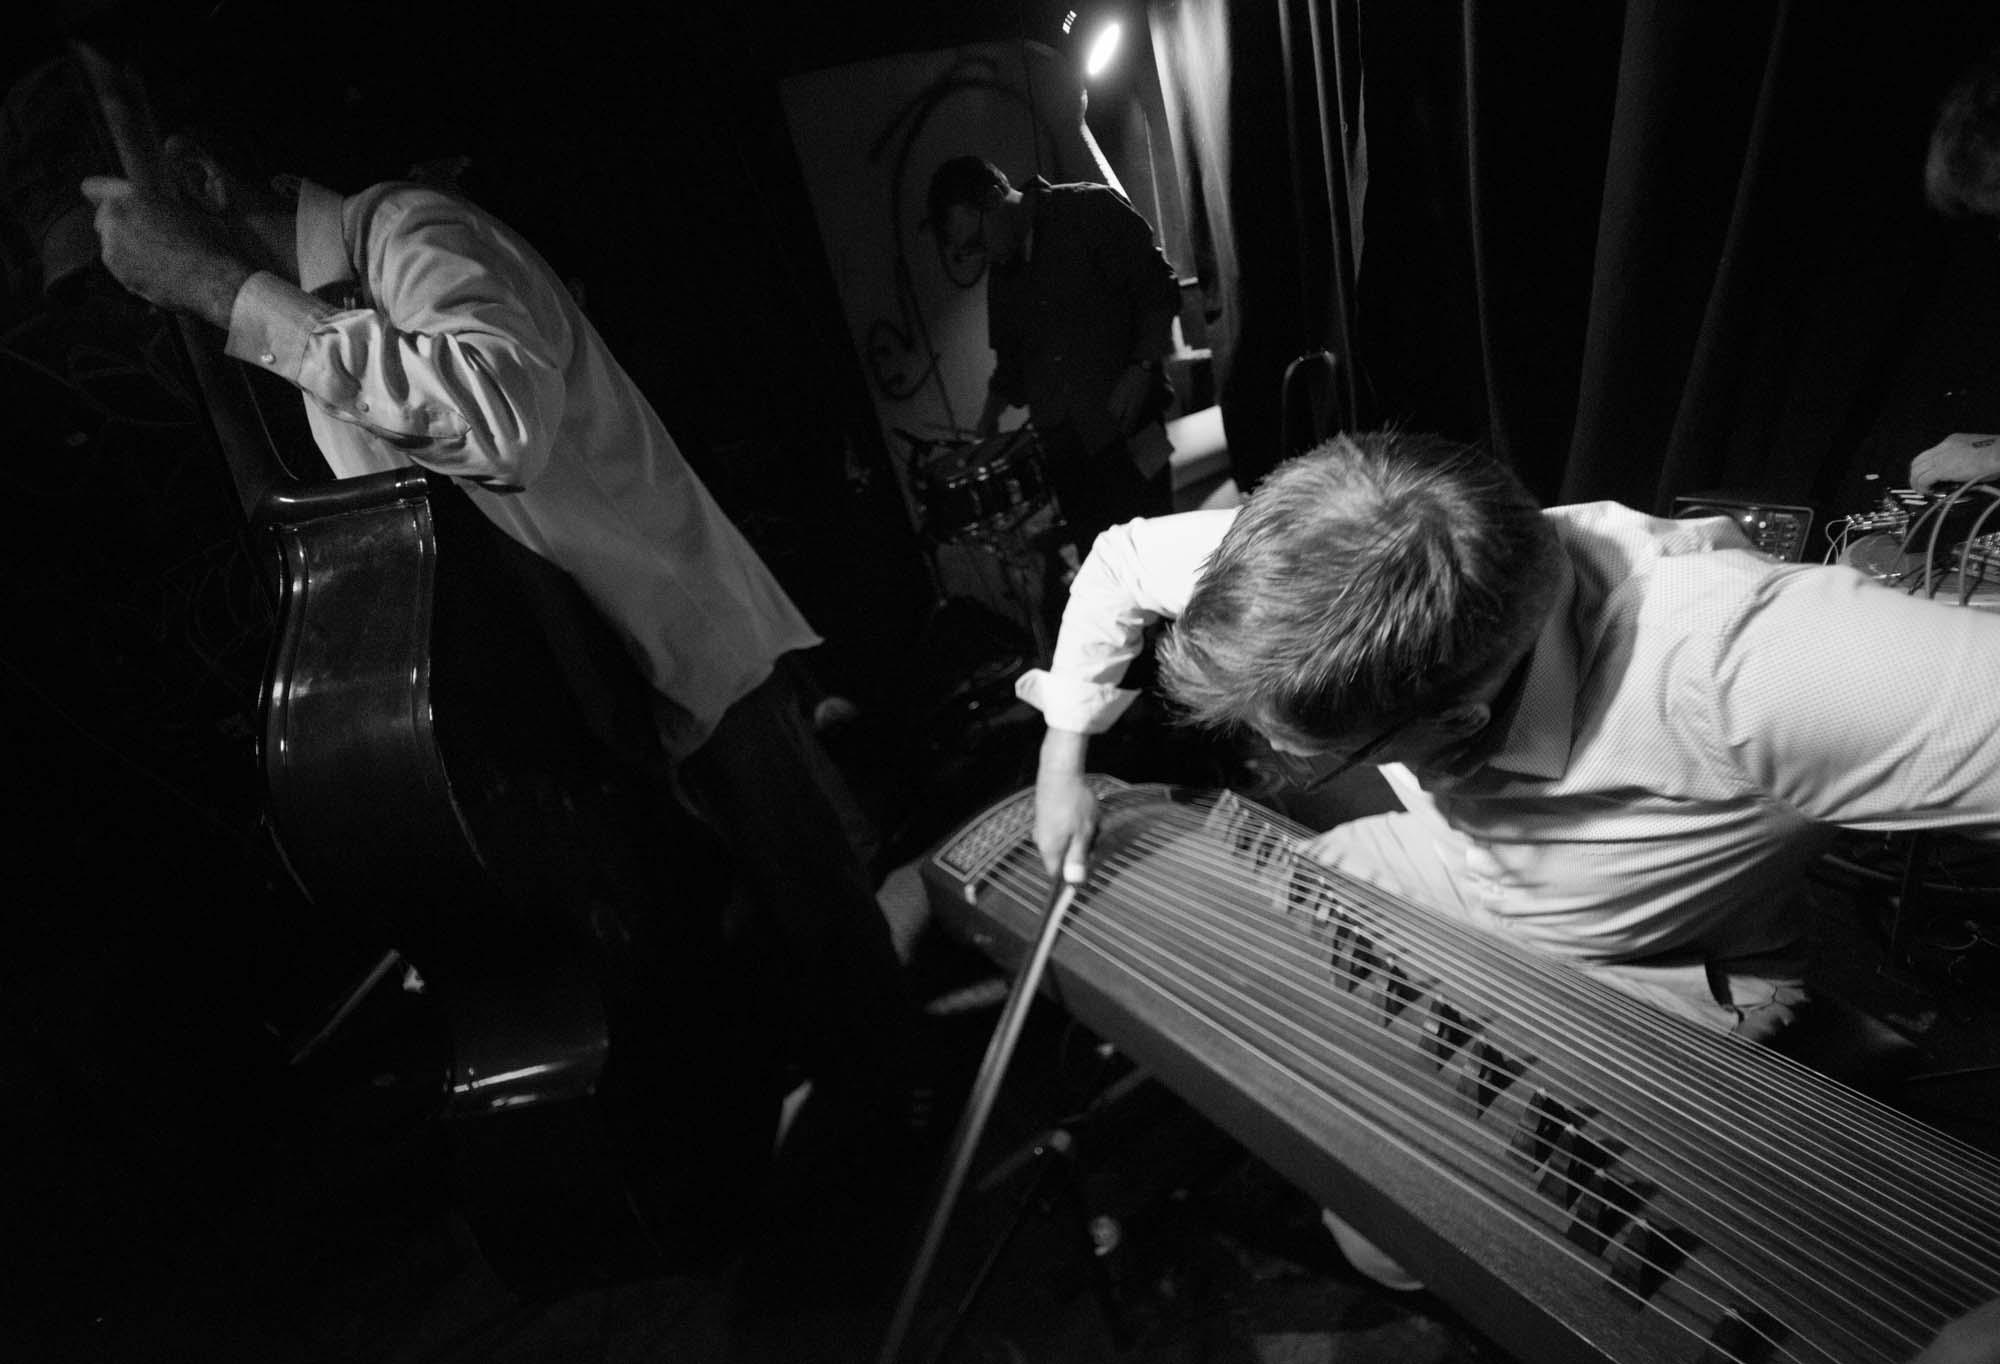 Trepanning Trio: David Mansbach, Kris Morron, Joel Elvery